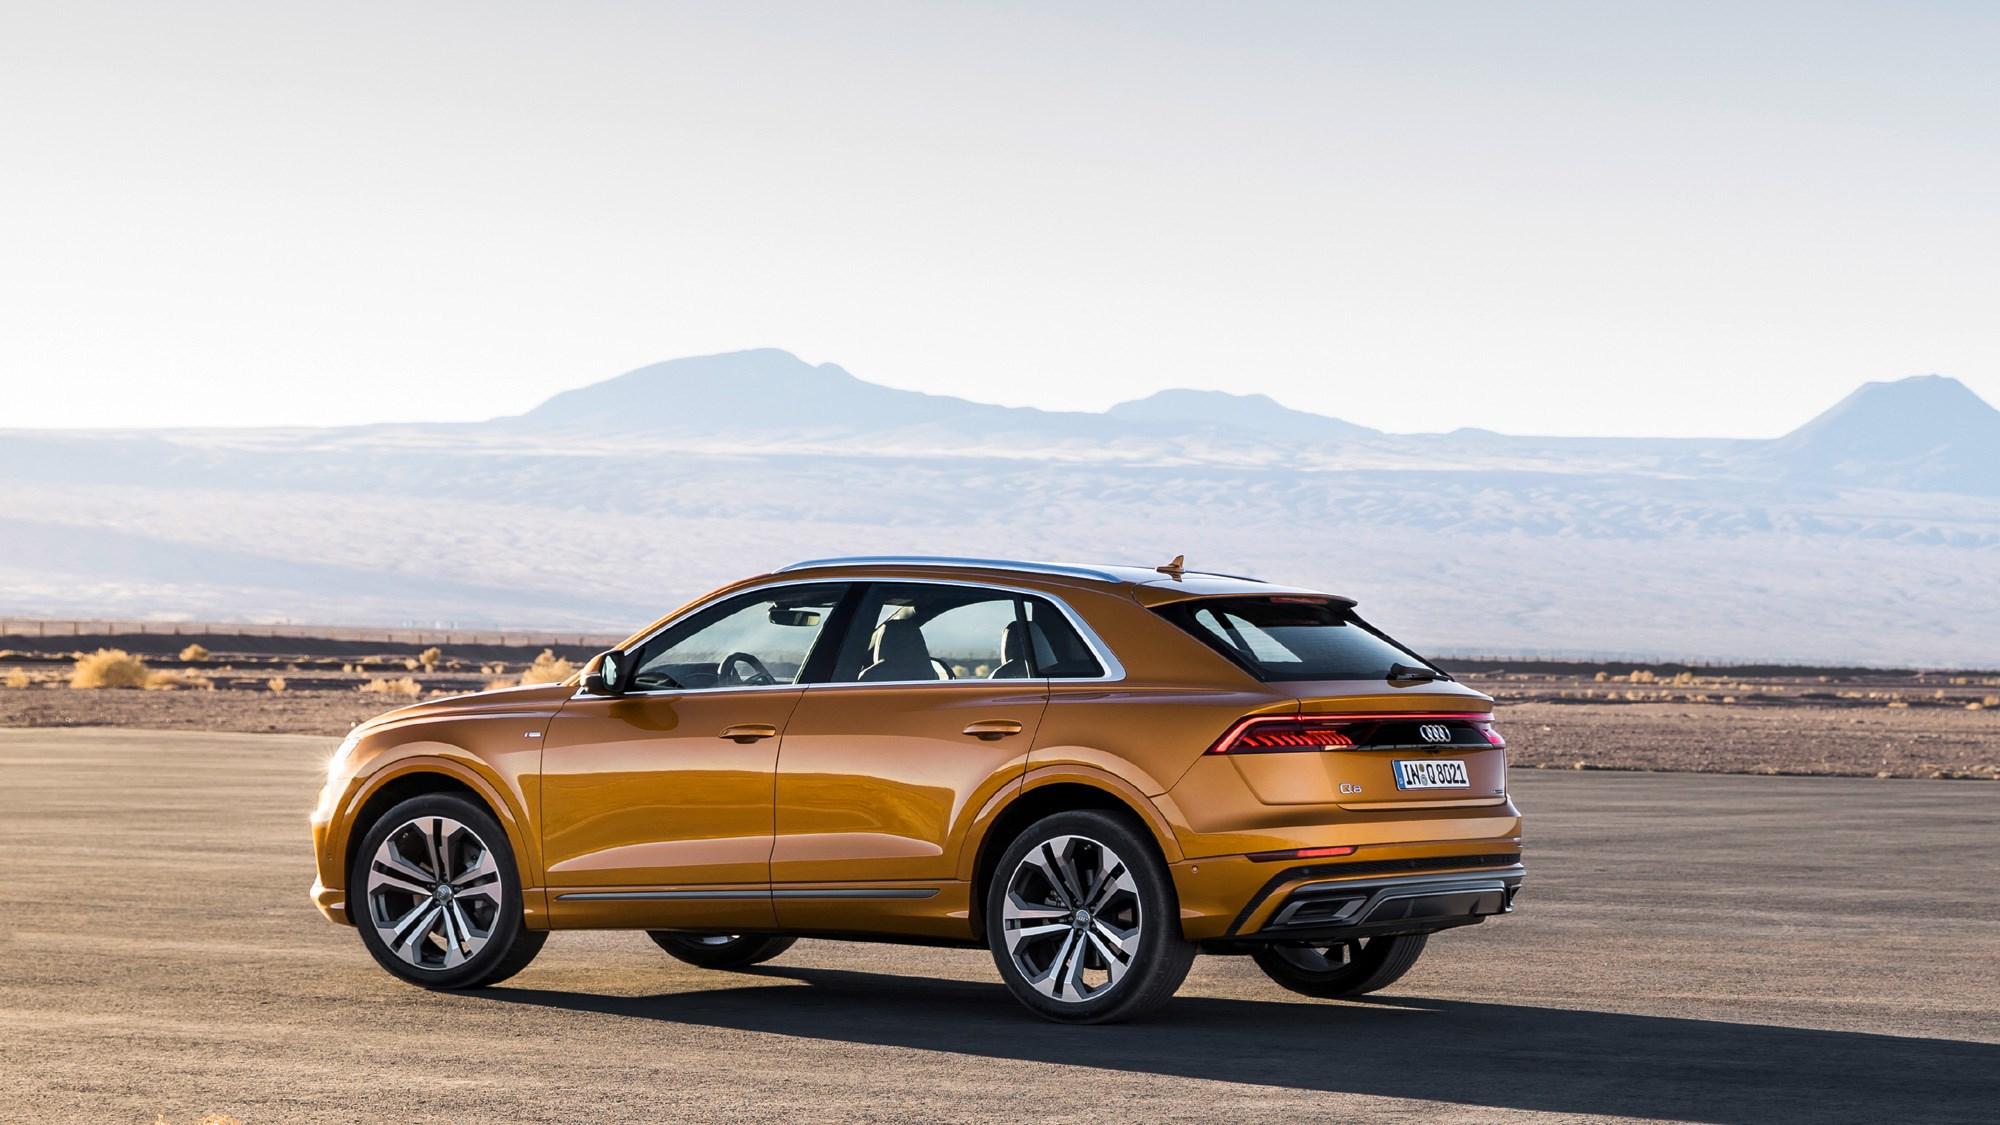 Audi Suv Lease >> Audi Q8 review: a worthy flagship? | CAR Magazine